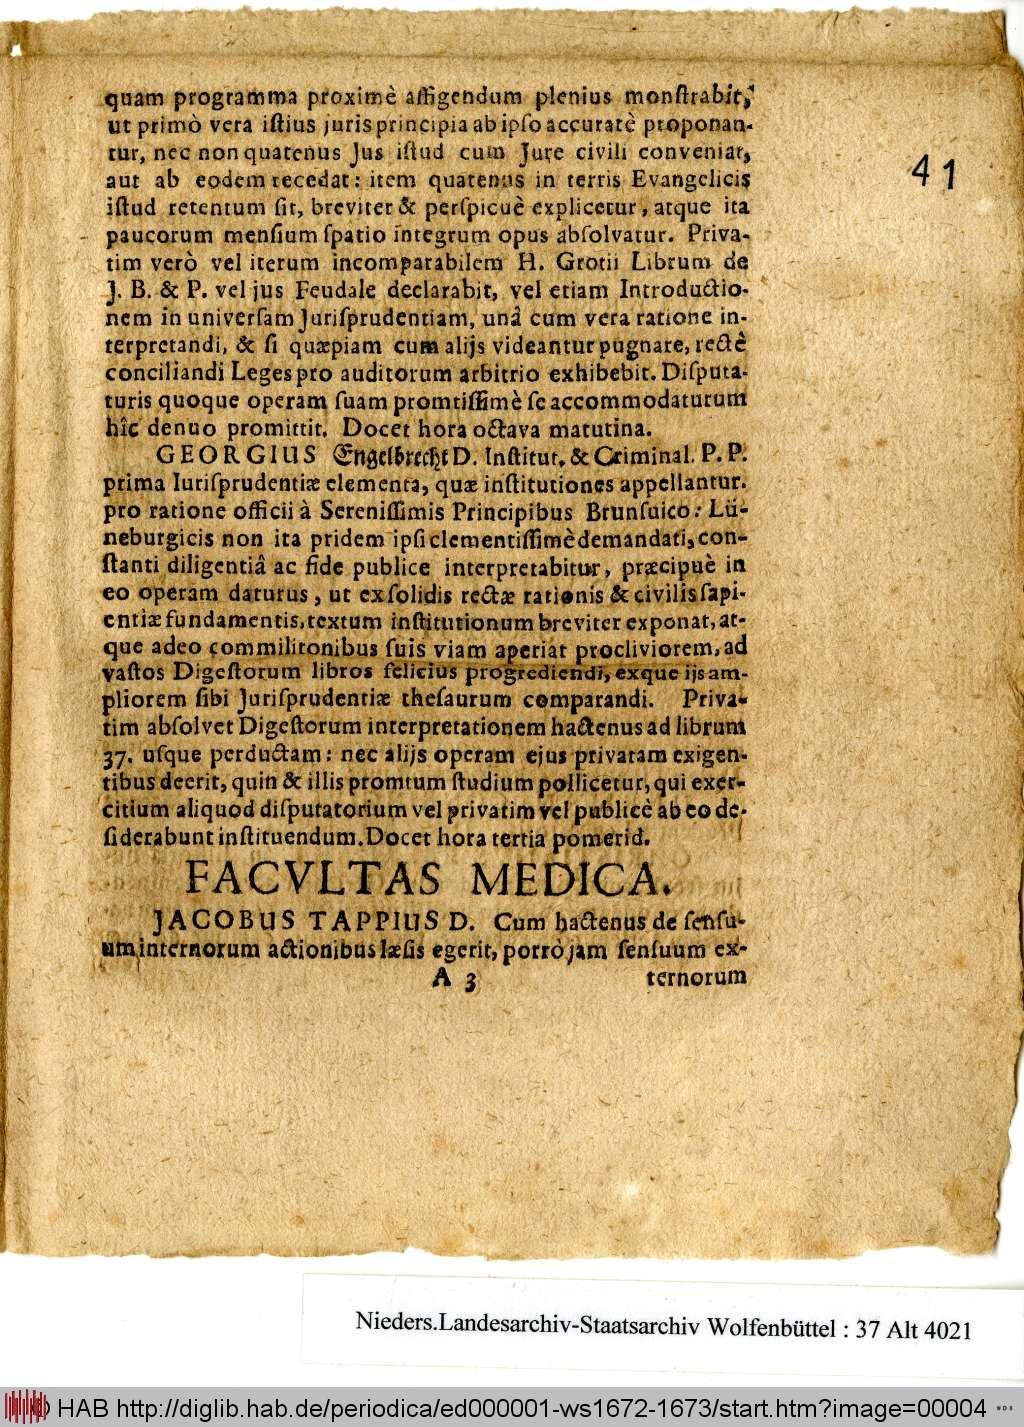 https://diglib.hab.de/periodica/ed000001-ws1672-1673/00004.jpg